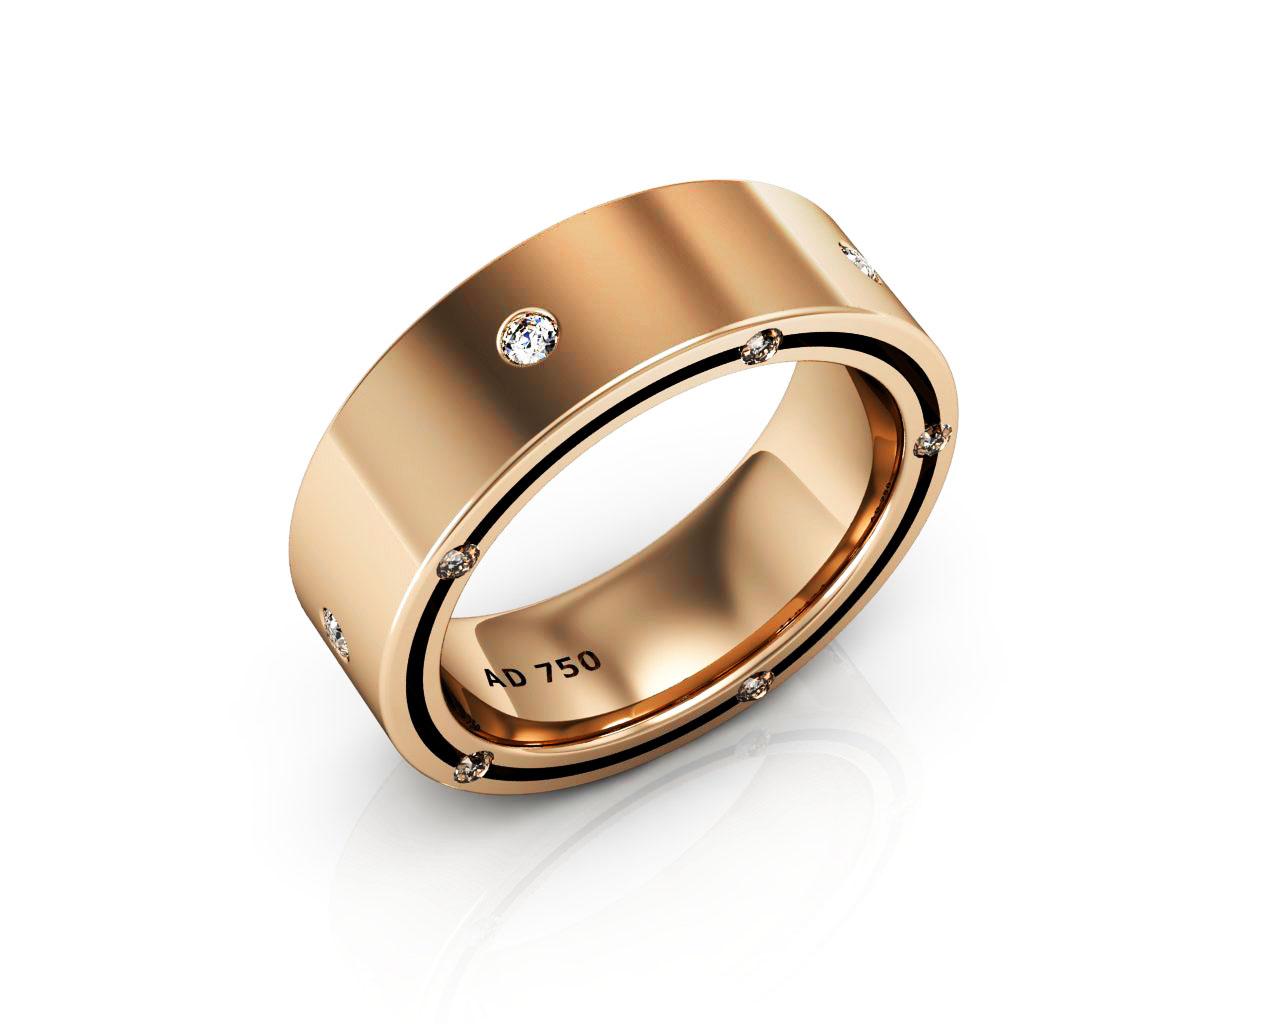 15 stone diamond rose gold mens engagement ring 1 gold mens wedding bands 15 Stone Diamond Rose Gold Men s Wedding Bands